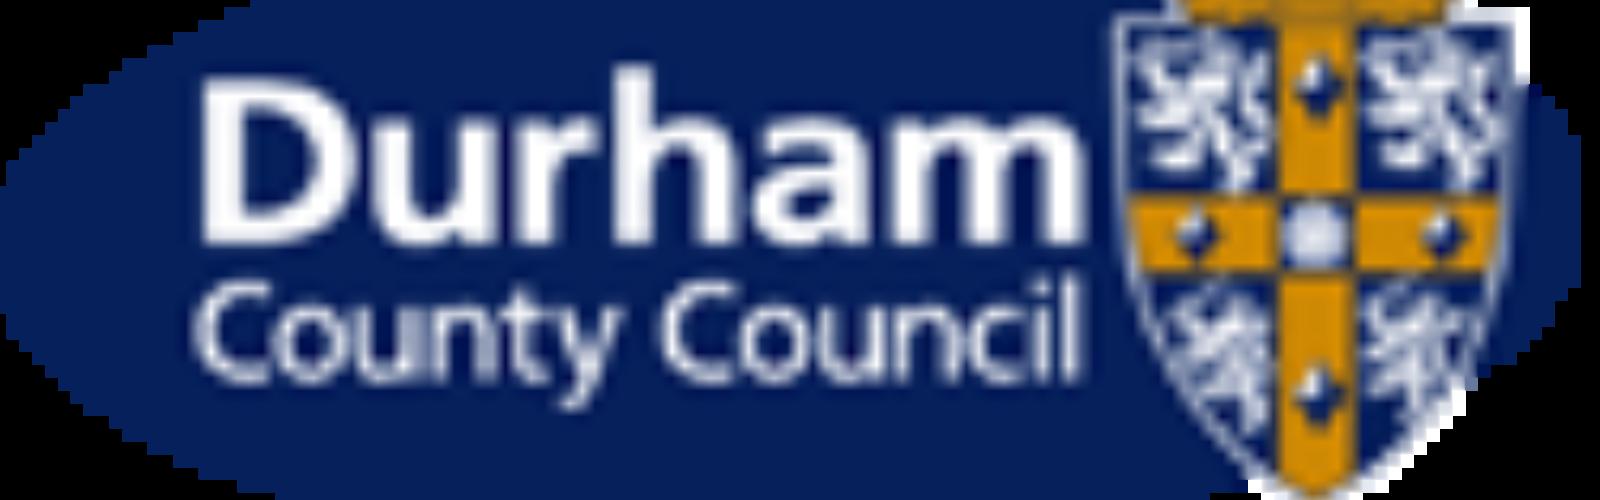 durham county council logo web rip nov 2019._nol 125x115pxpng.png